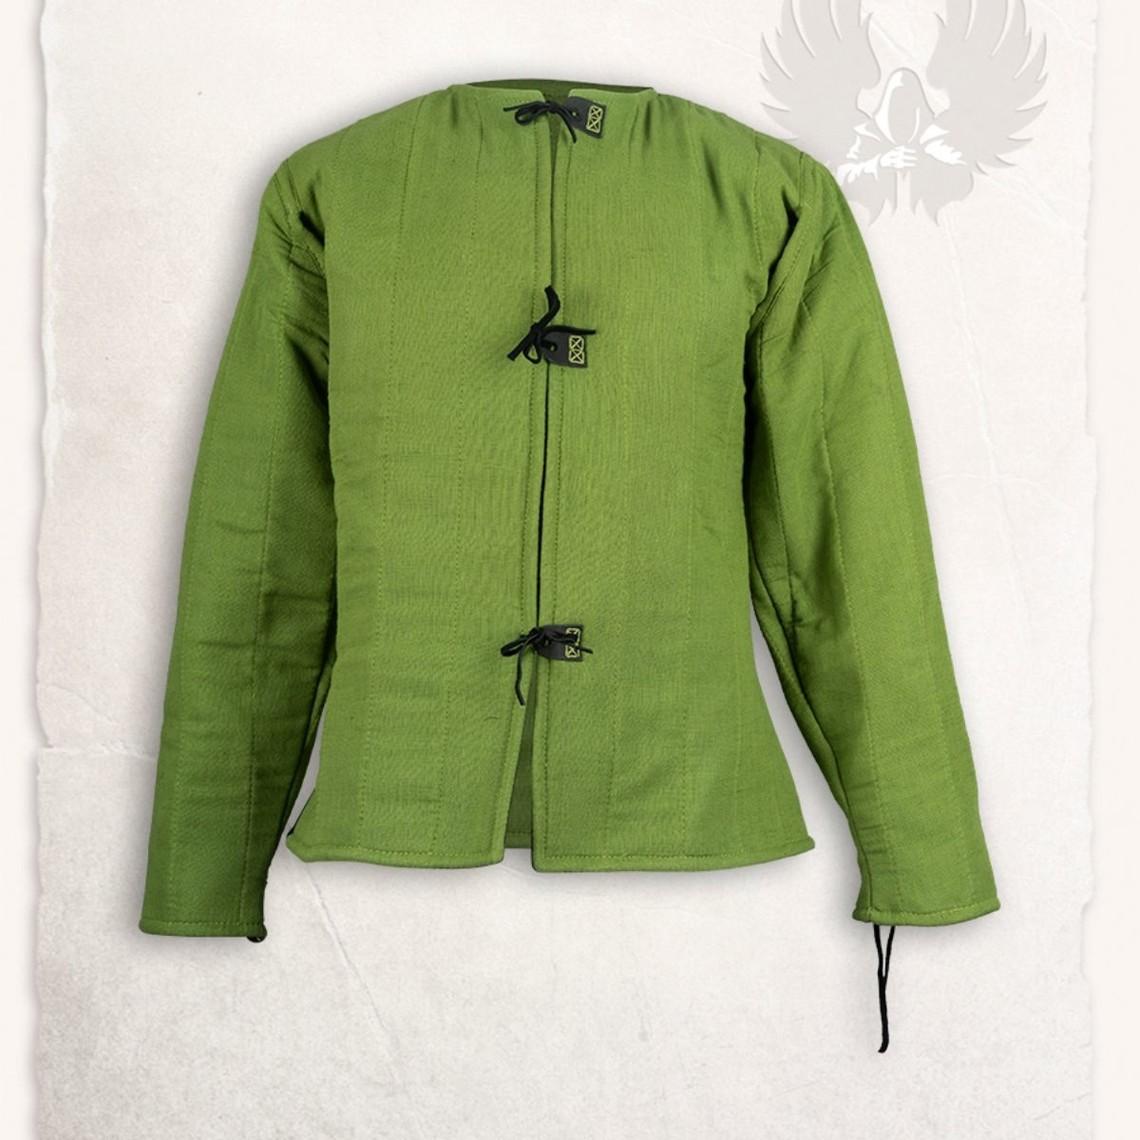 Mytholon Linge gambison Aulber vert